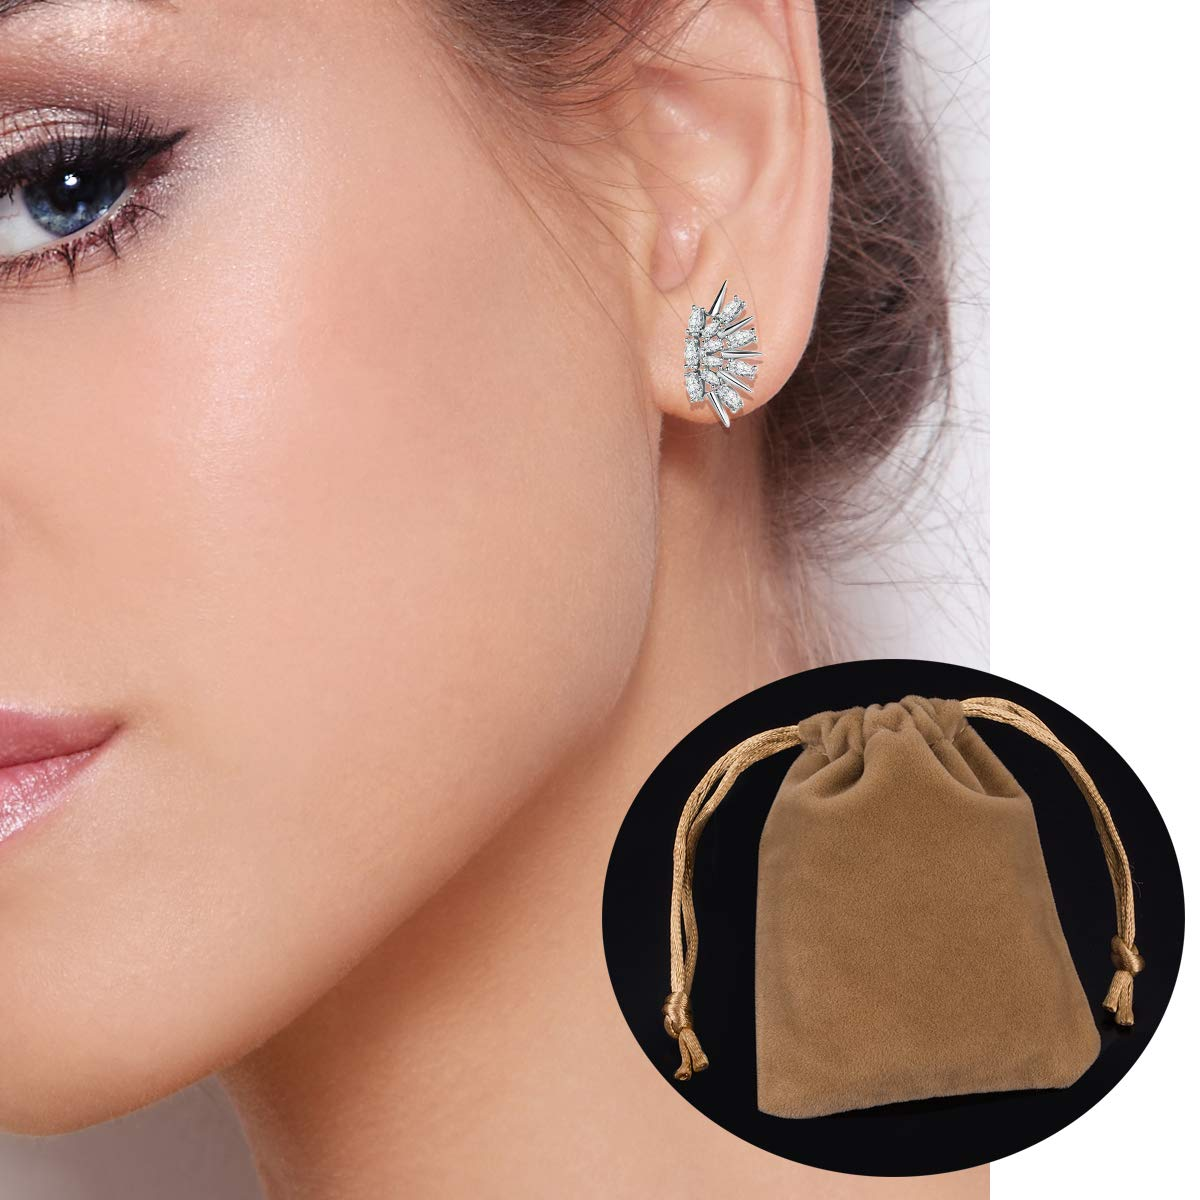 Cubic Zirconia Stud Earrings for Women Hypoallergenic for Sensiive Ears